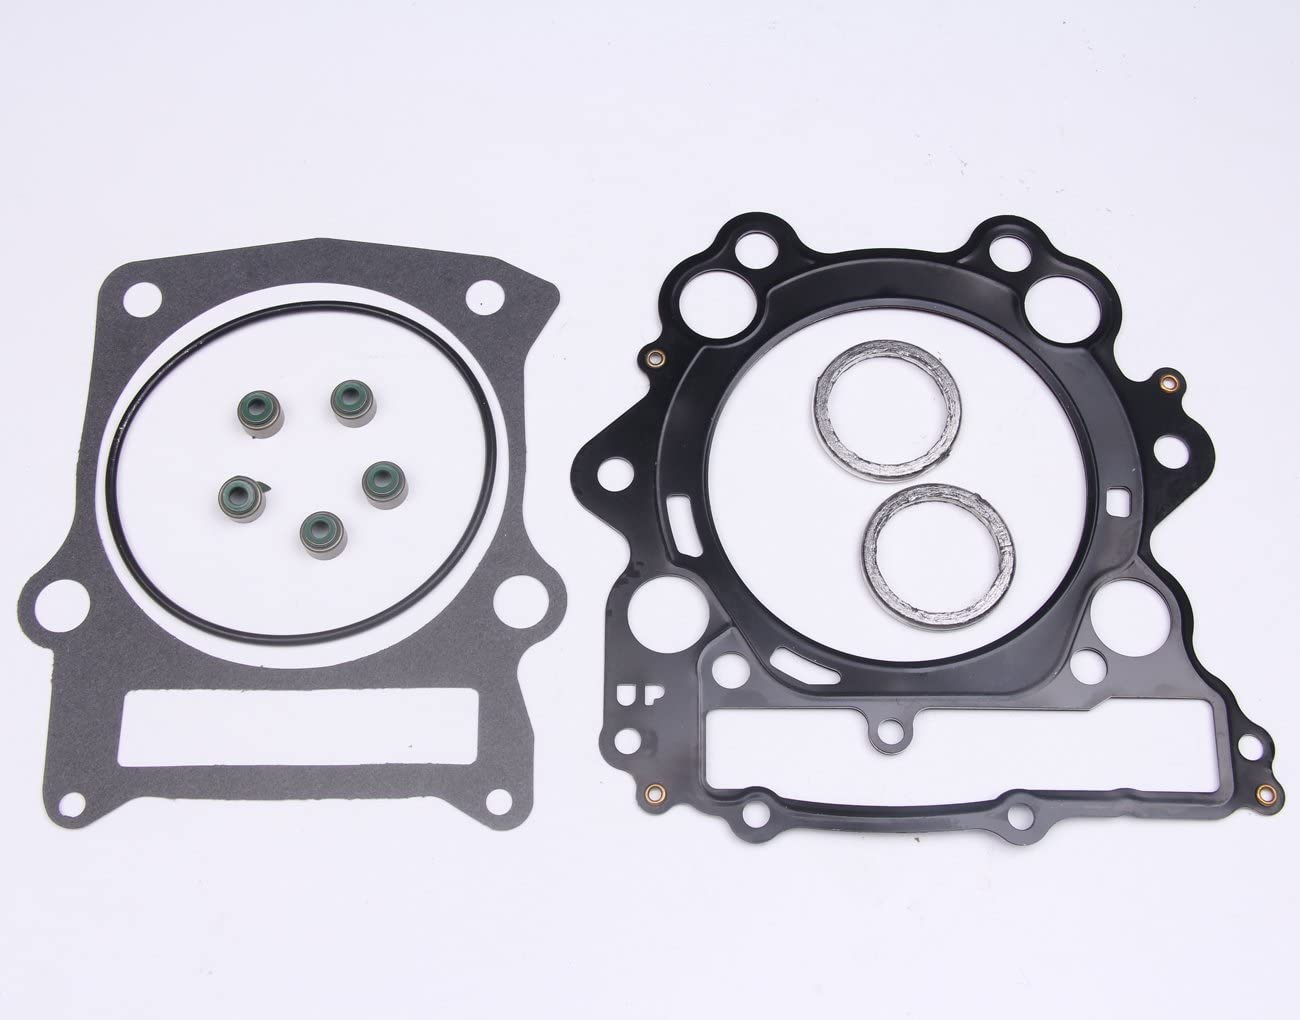 Winderosa Engine Oil Seal Kit For Yamaha YFM660 Grizzly 2002-2008 660cc